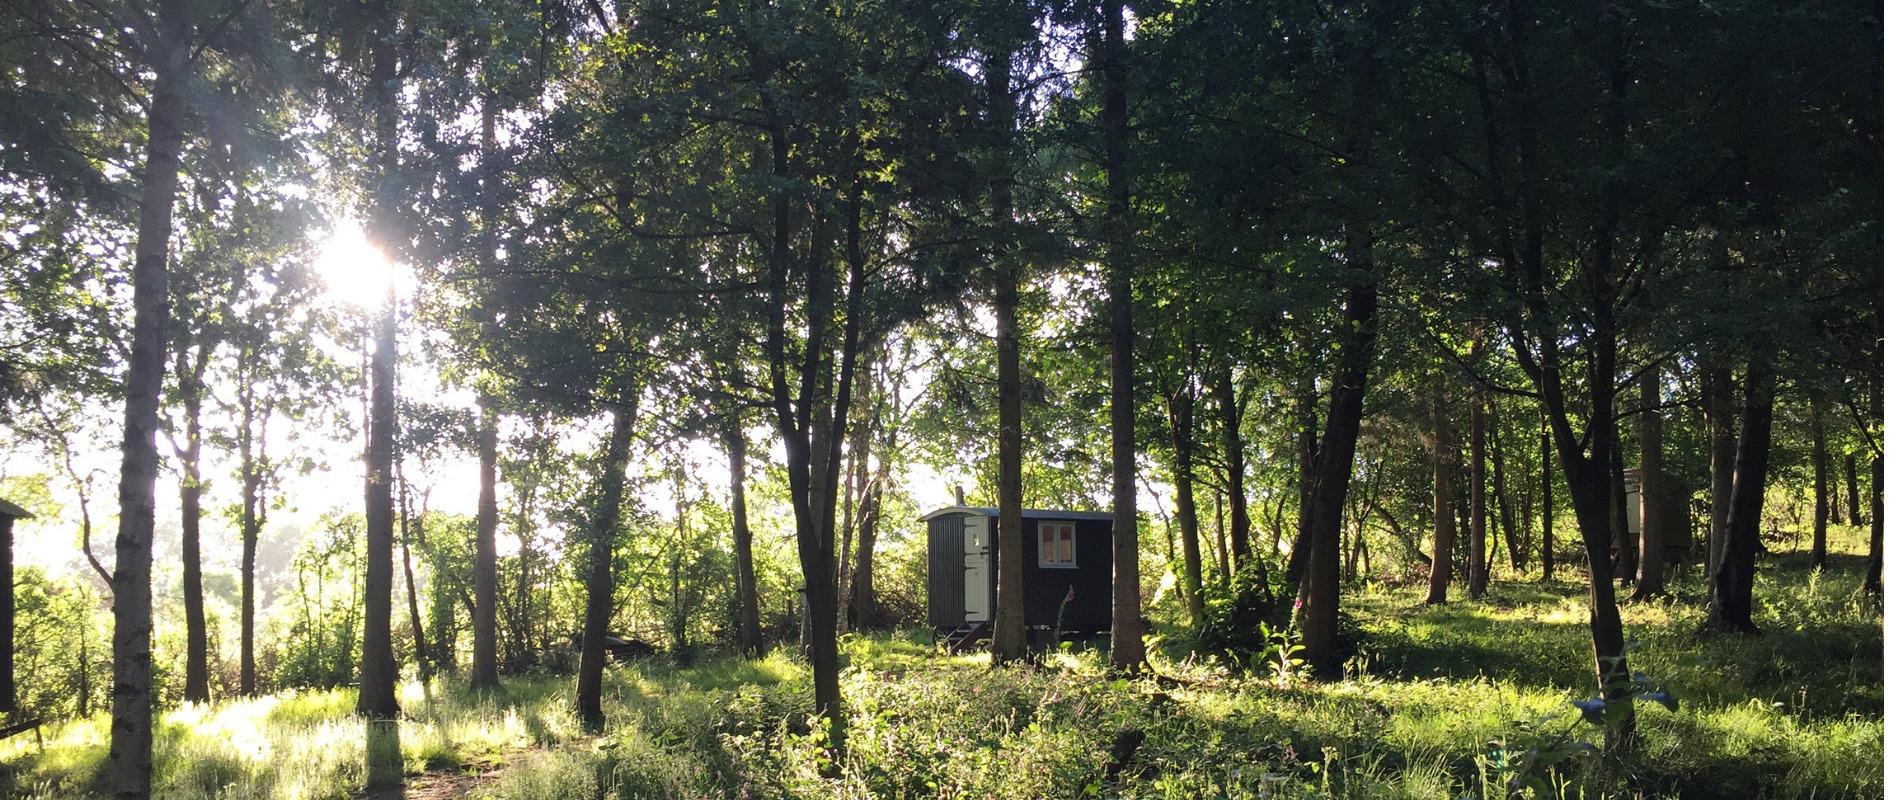 shepherds hut in woodland with dappled sunlight